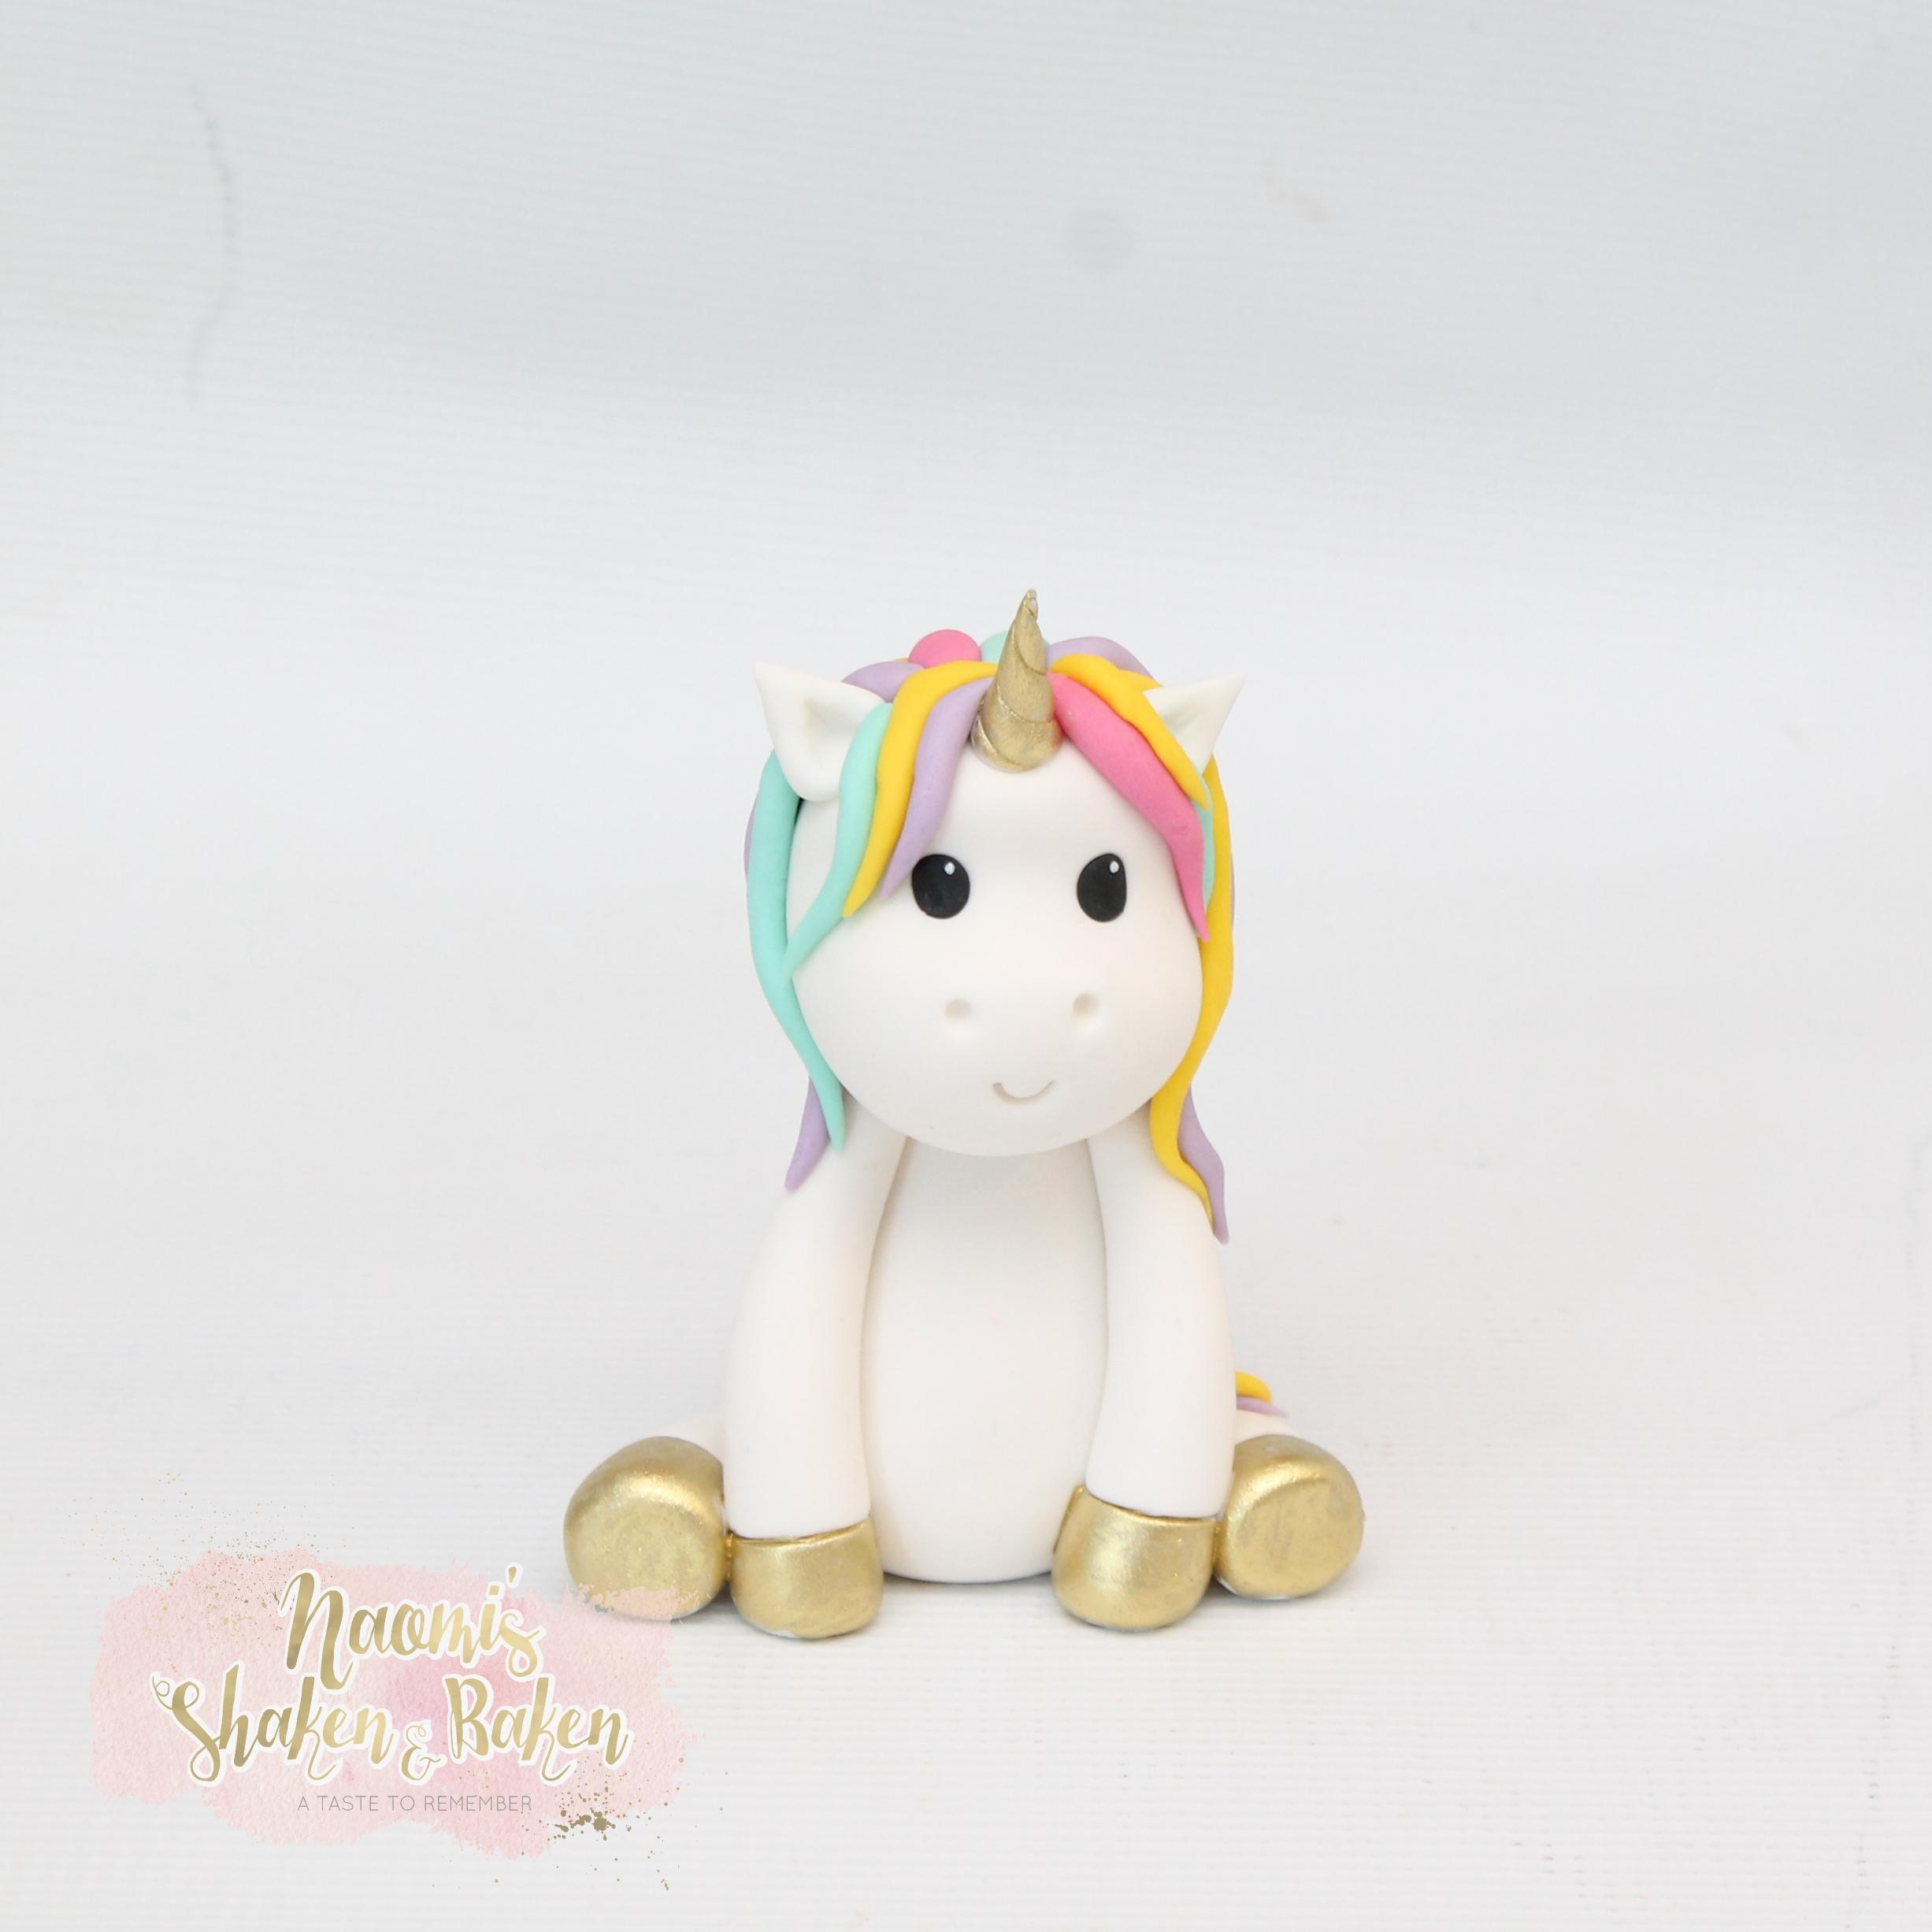 Edible Fondant Unicorn Cake Topper